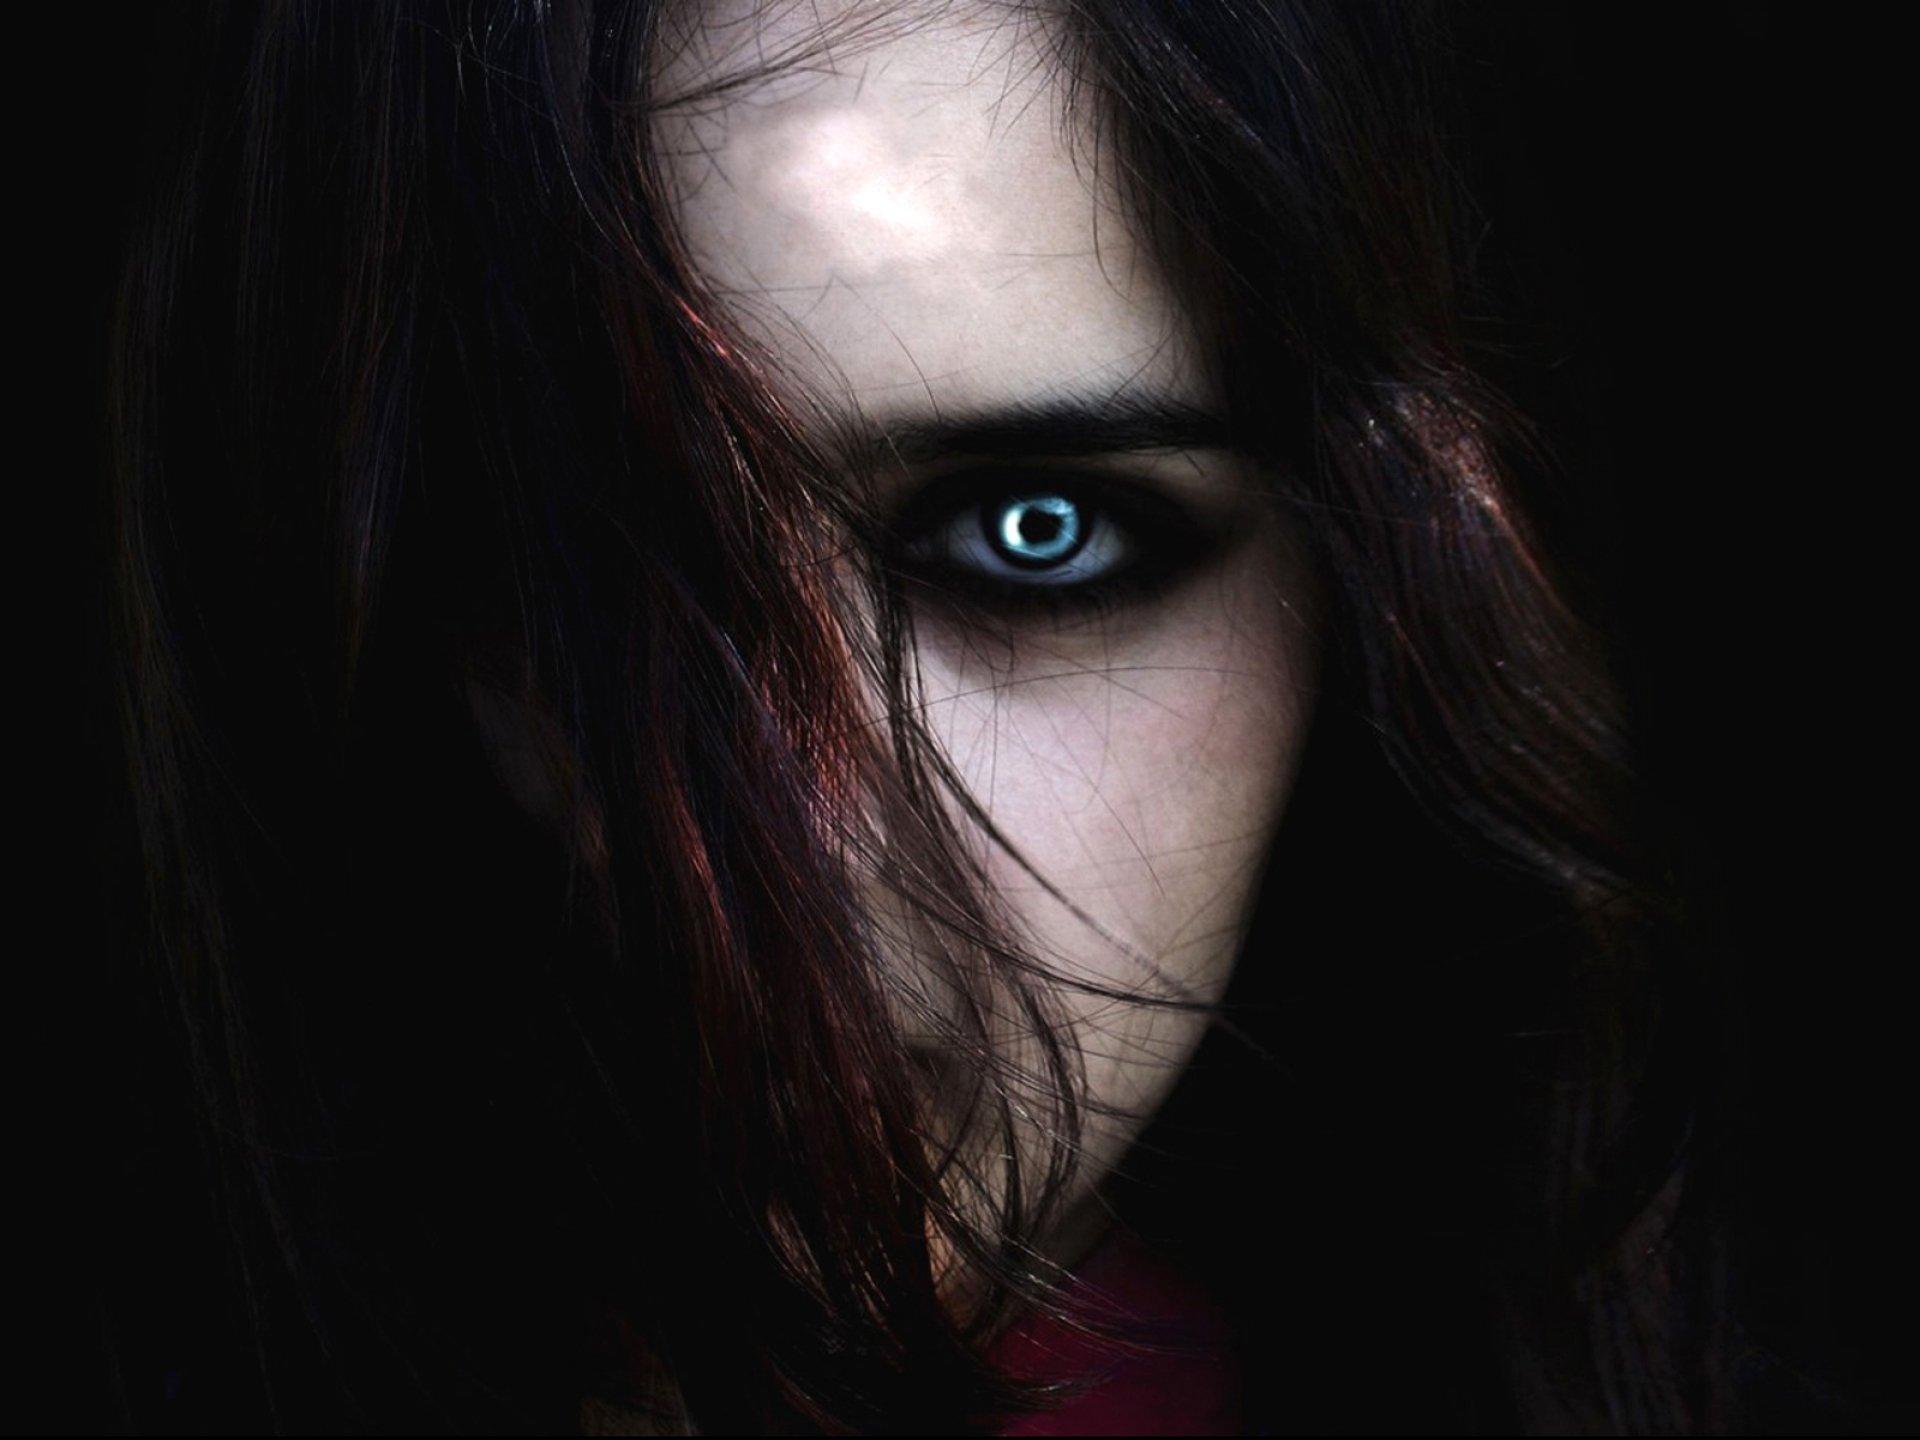 scary vampire wallpaper - photo #24